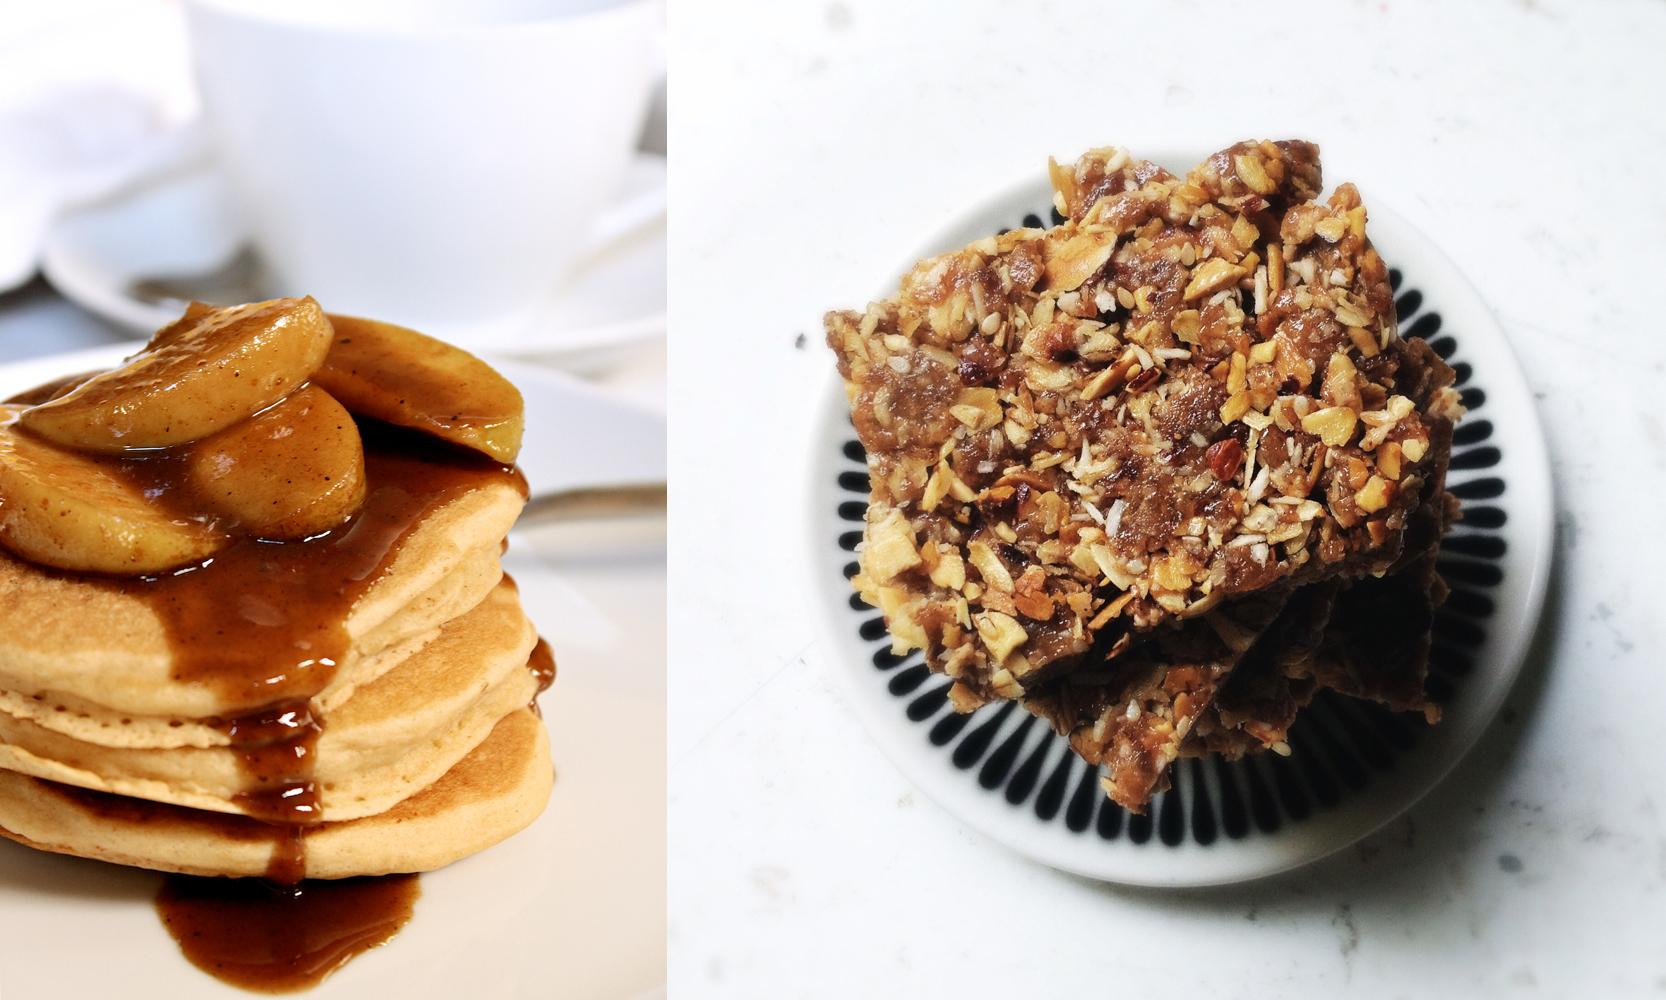 pancakes and granola bar diptych.jpg